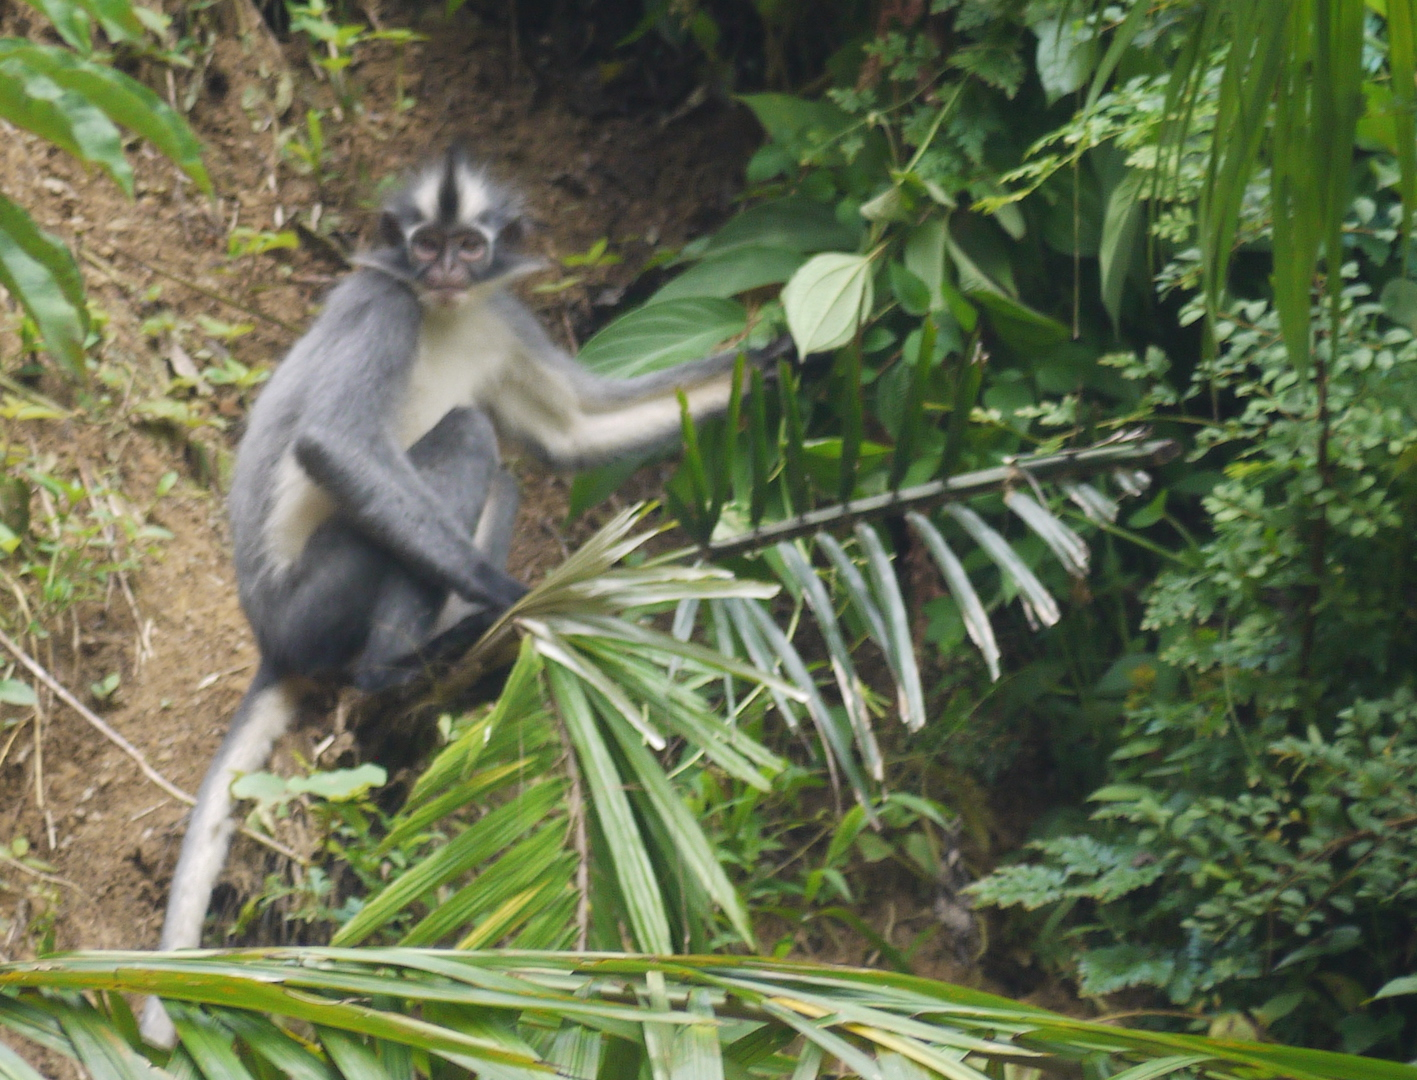 Thomas' Langur, a species of leaf monkey, feeding on foliage  (photo by William Laurance)